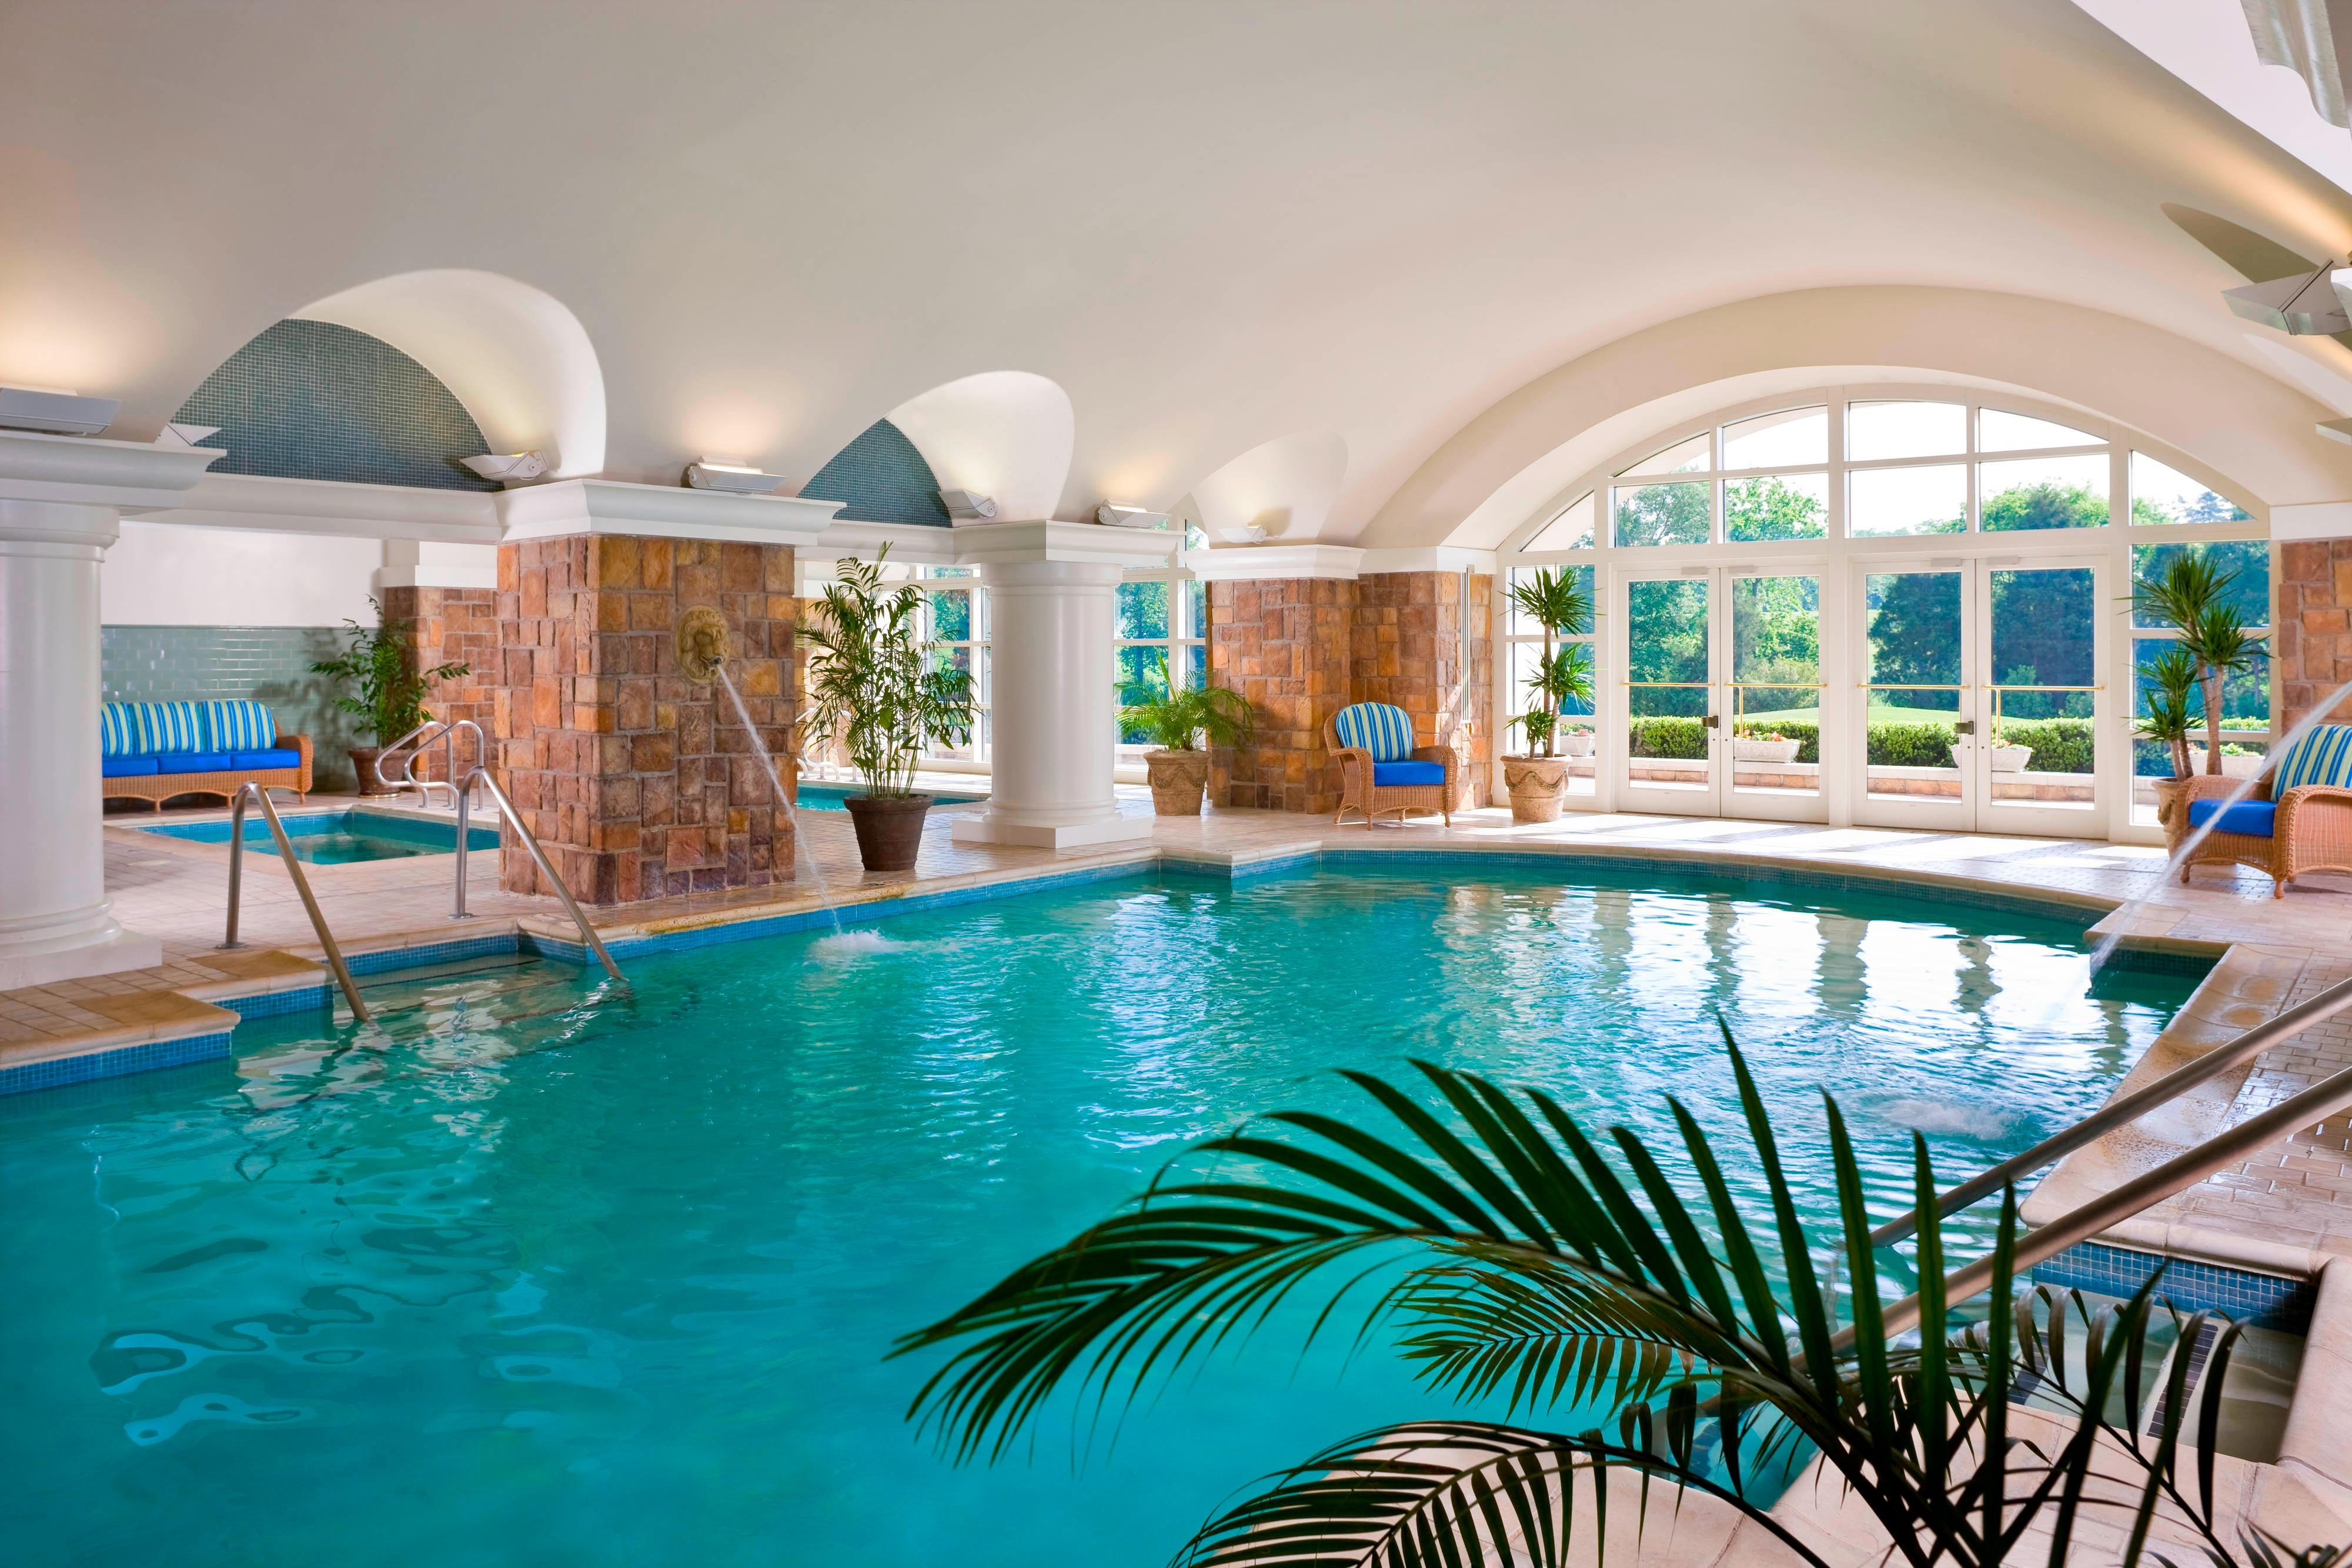 The Ballantyne Indoor Pool